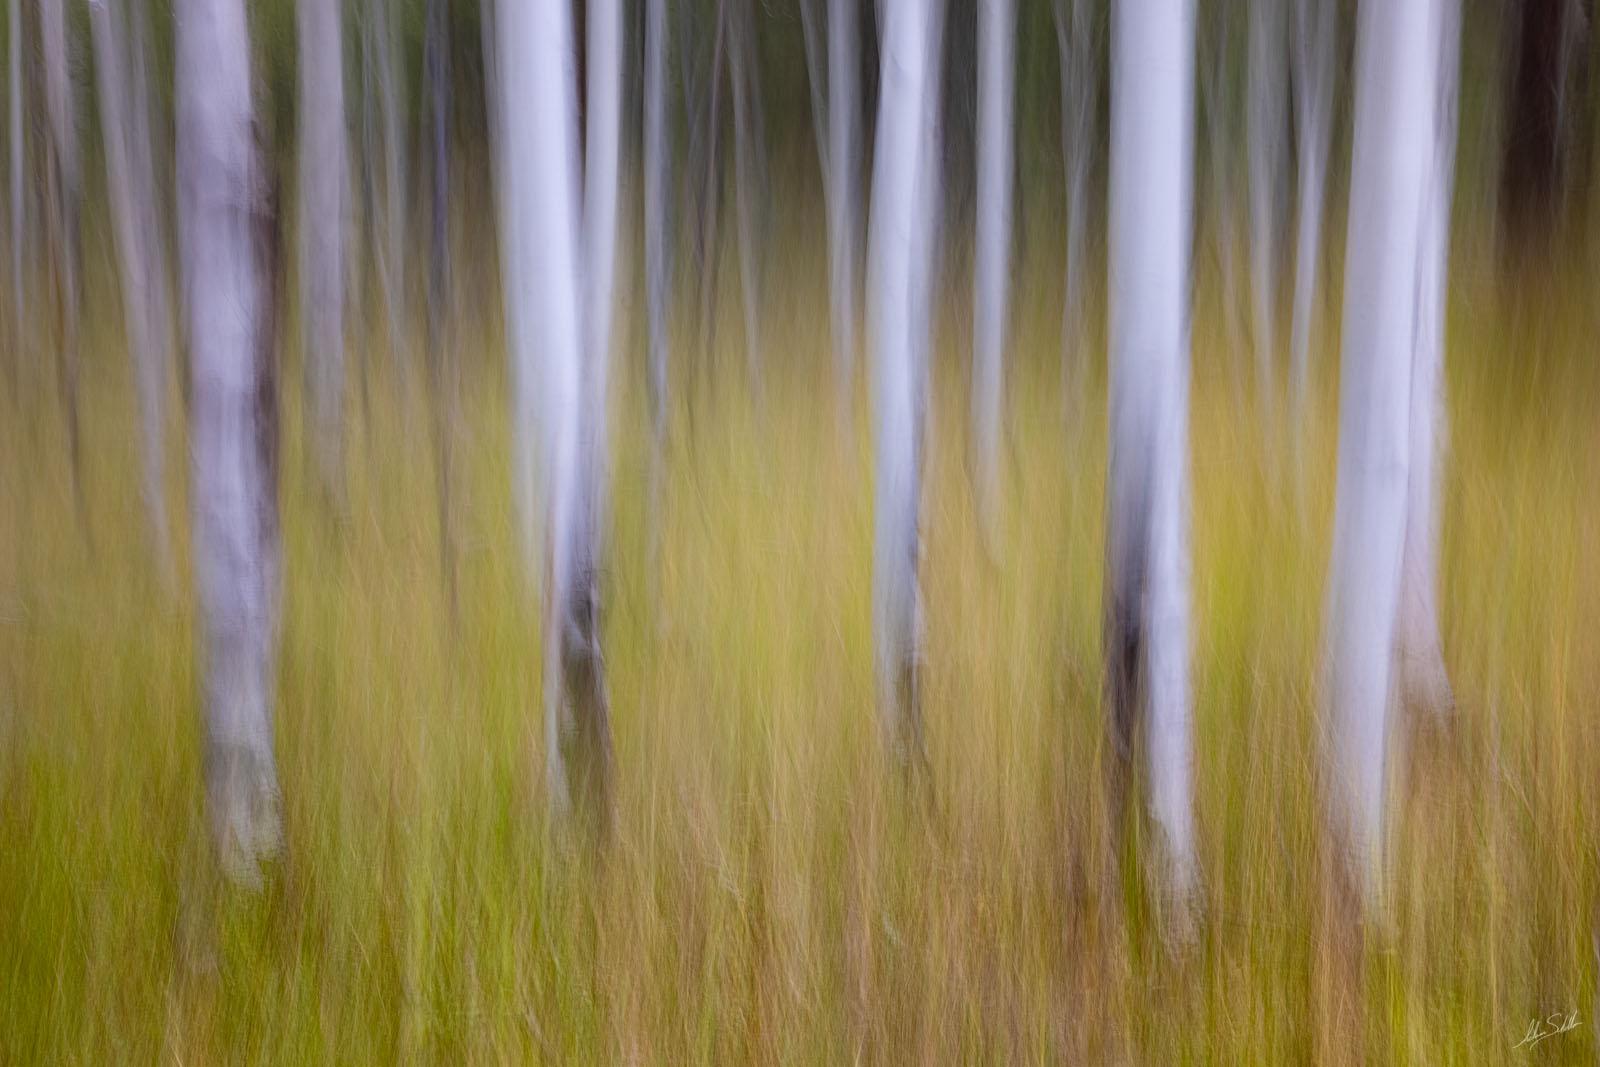 AZ, Abstract, Arizona, Art, Blur, Coconino National Forest, Flagstaff, Hart Prairie, ICM, Impressionistic, In Camera Motion, photo